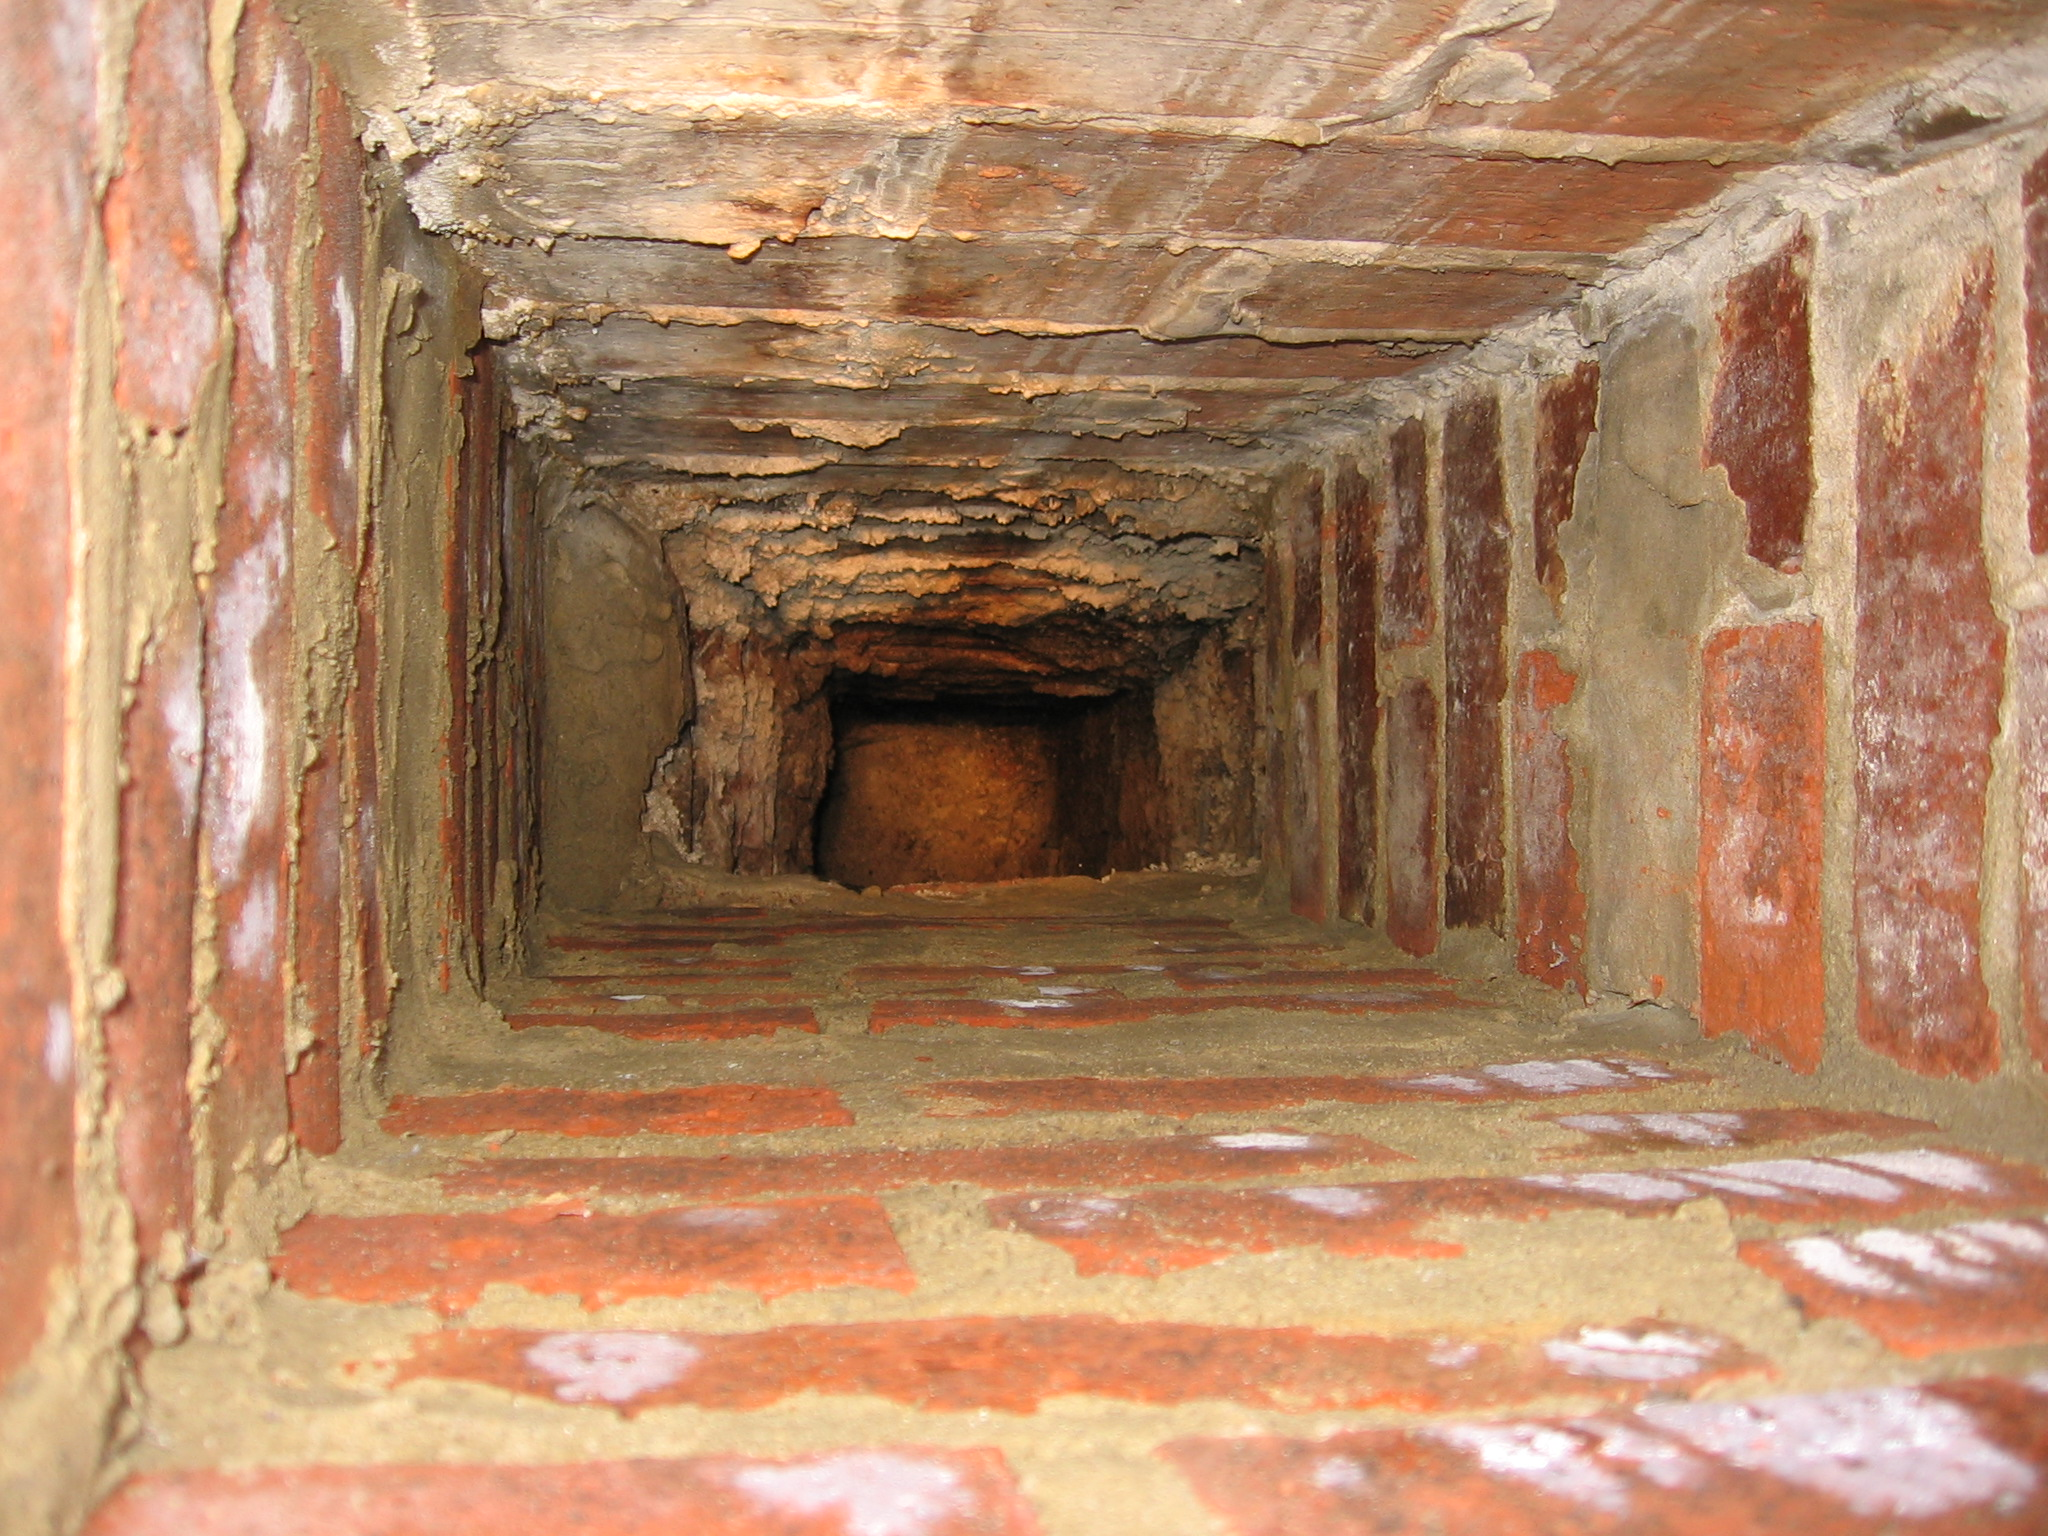 Chimney Camera Inspection Chimney Cctv Surveys Dorset